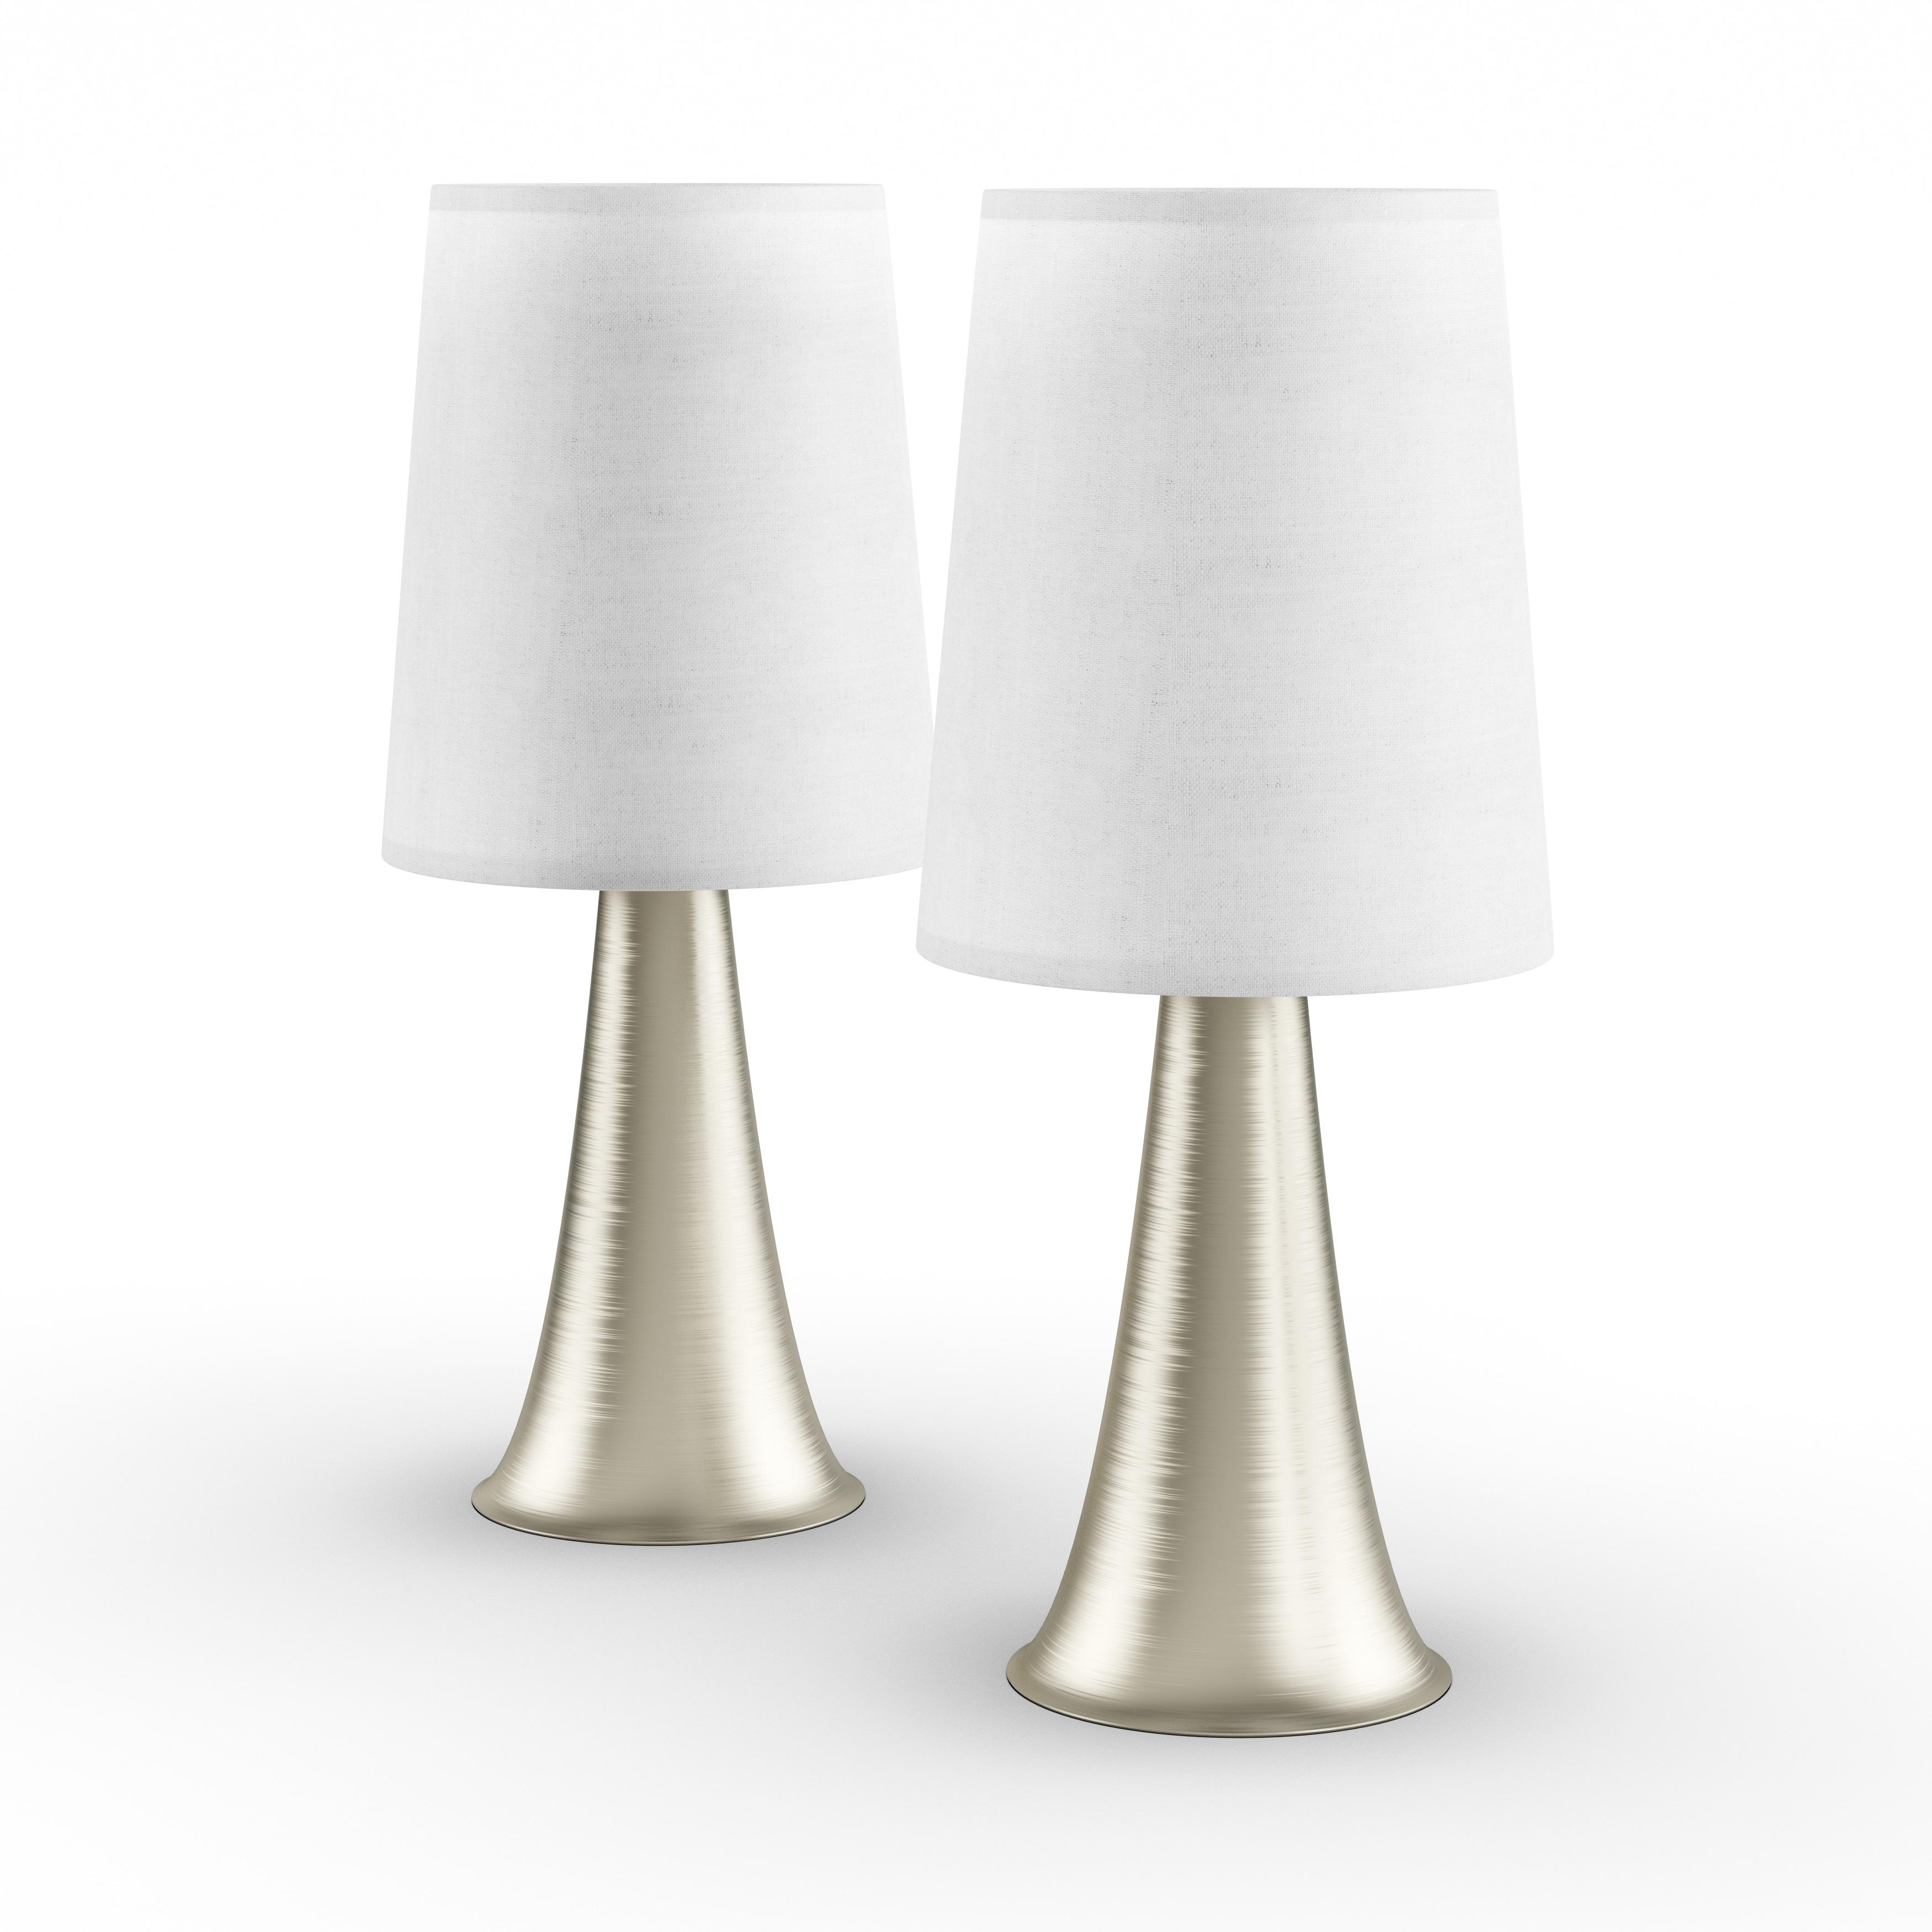 Buy Table Lamps Online At Our Best Lighting Deals Lamp Wiring Kit Ottlite